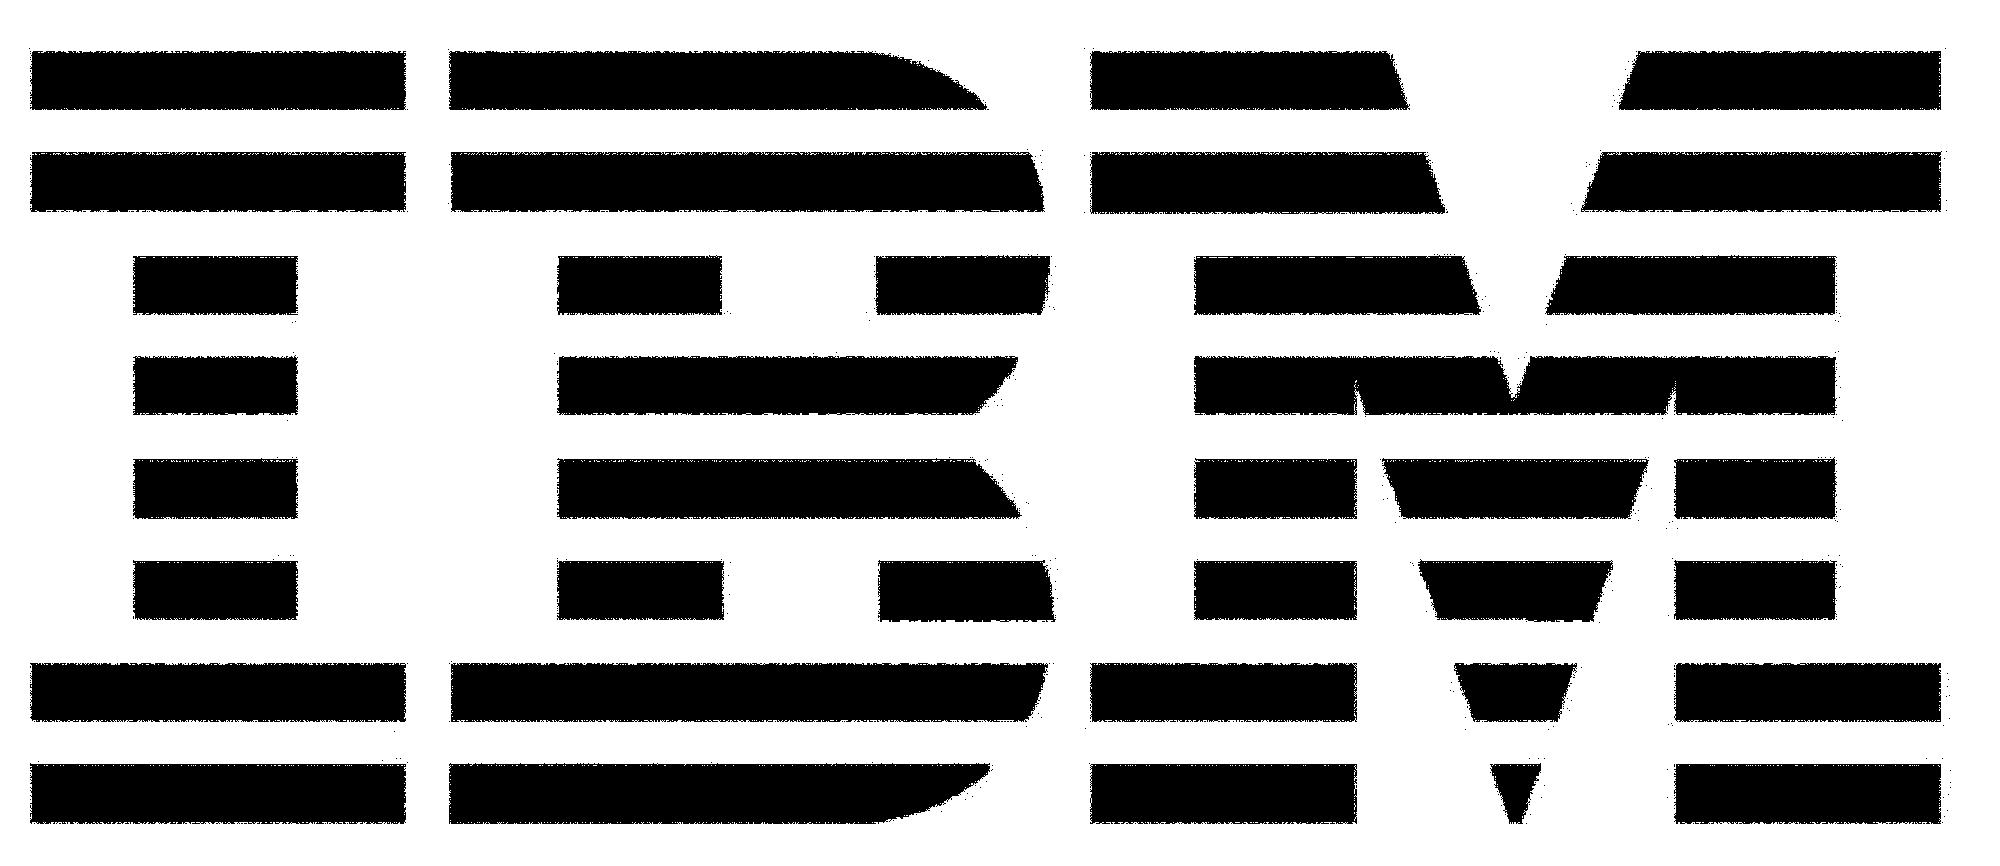 2017 IBM Emblem